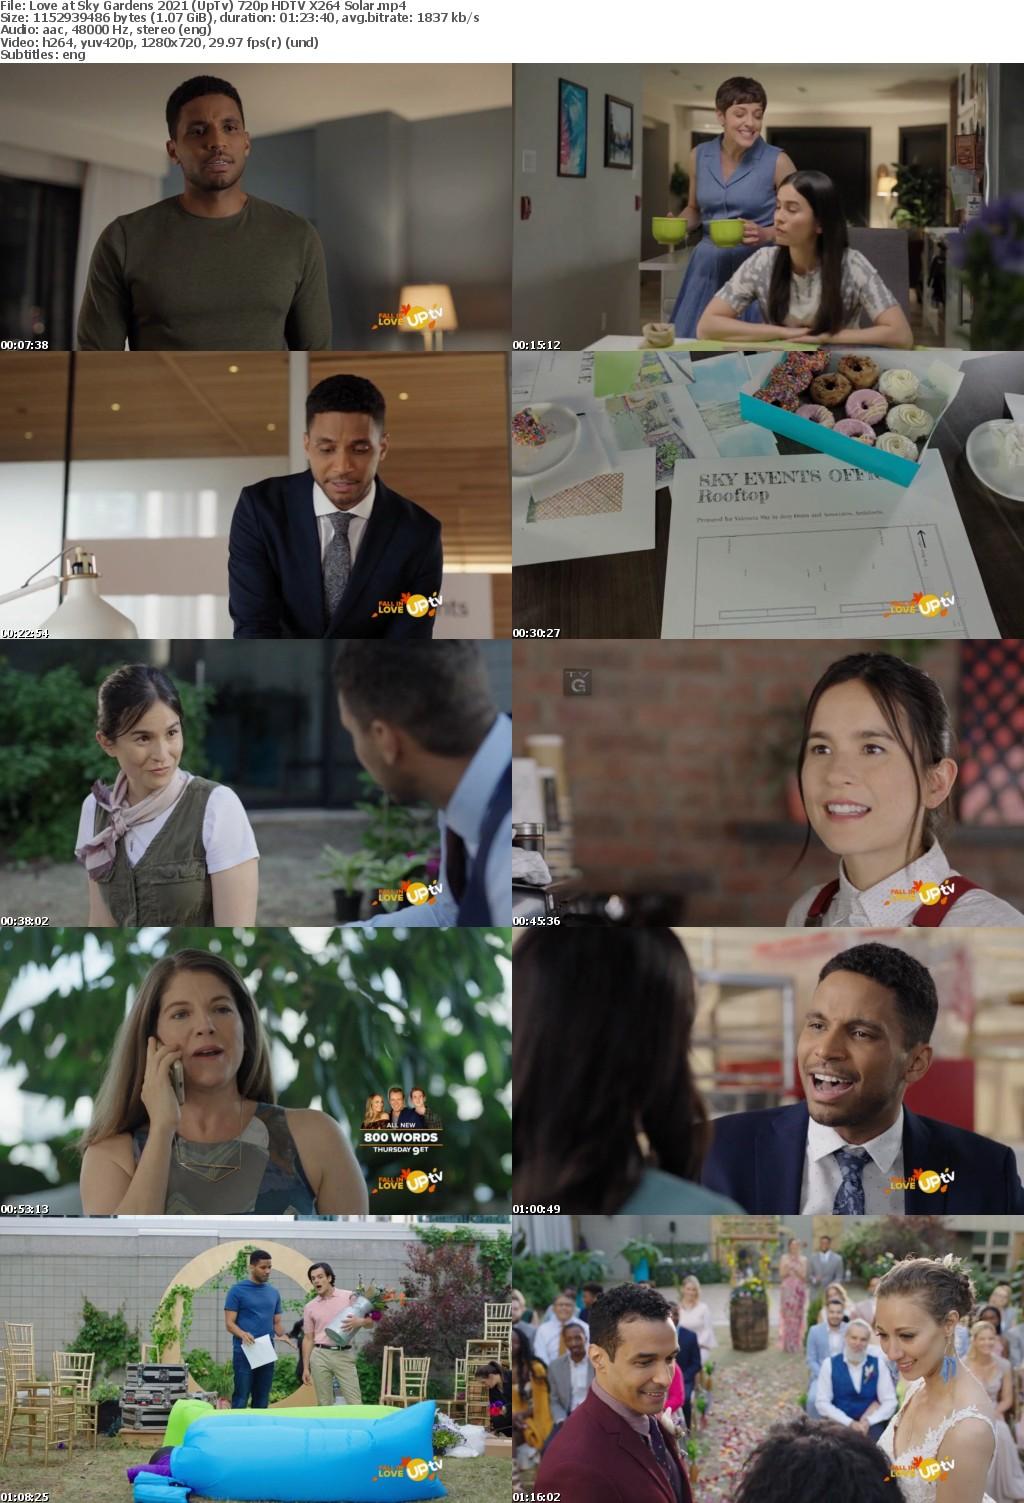 Love at Sky Gardens 2021 (UpTv) 720p HDTV X264 Solar